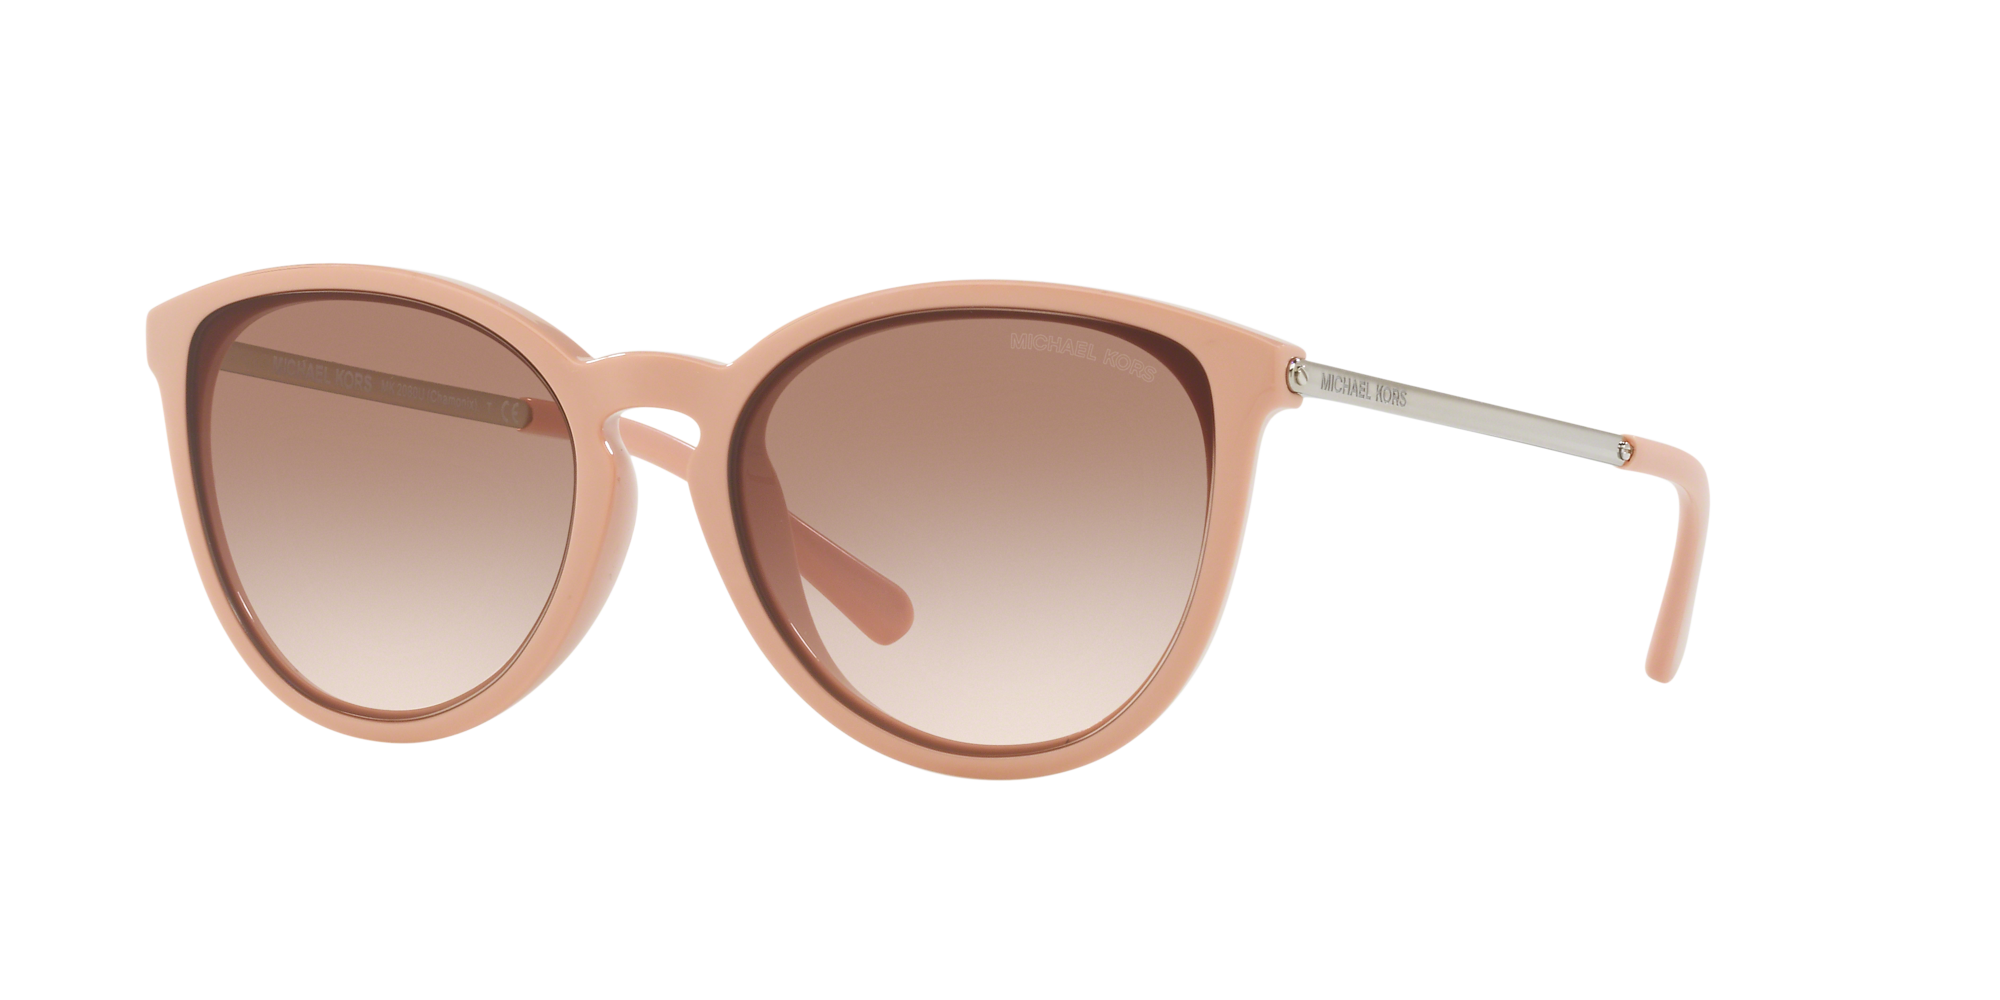 Michael Kors Mann  MK2080U CHAMONIX -  Frame color: Pink, Lens color: Braun, Size 56-18/140